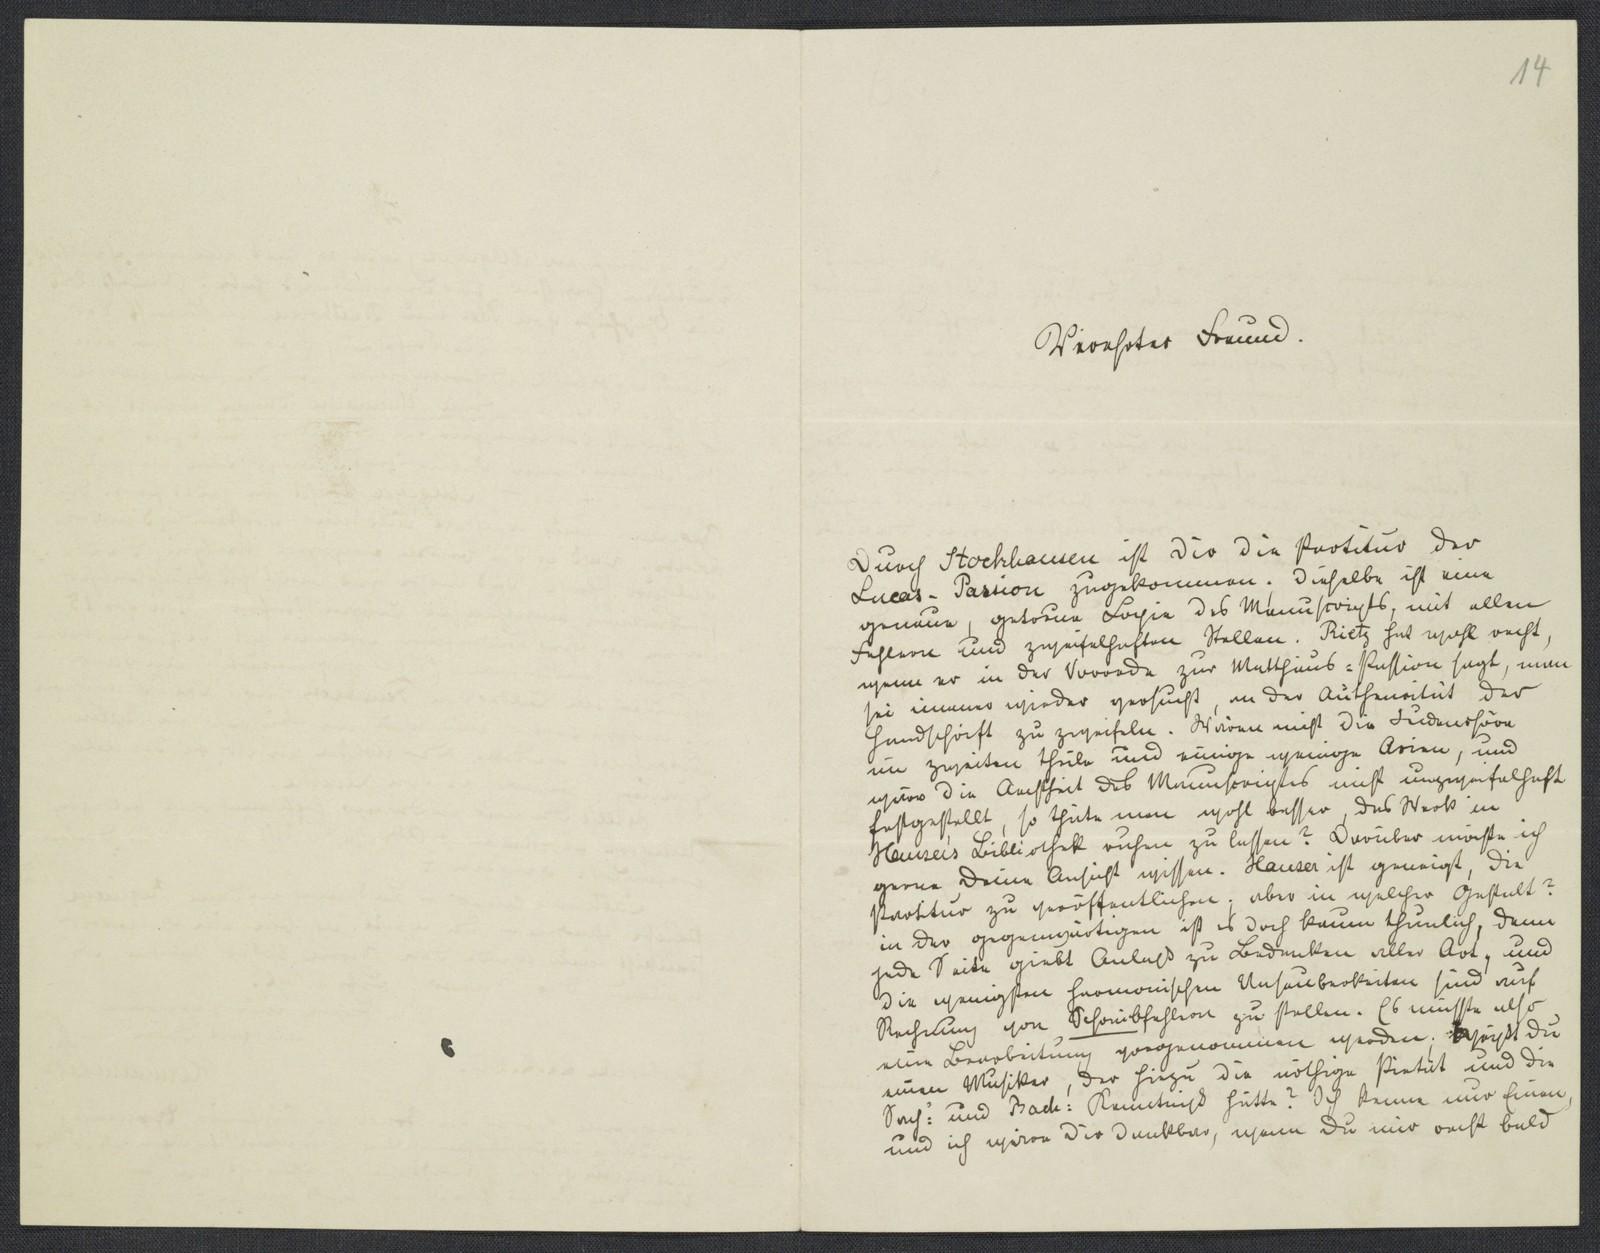 [Letter, 1869 Feb.] 22, Carlsruhe [to Brahms]